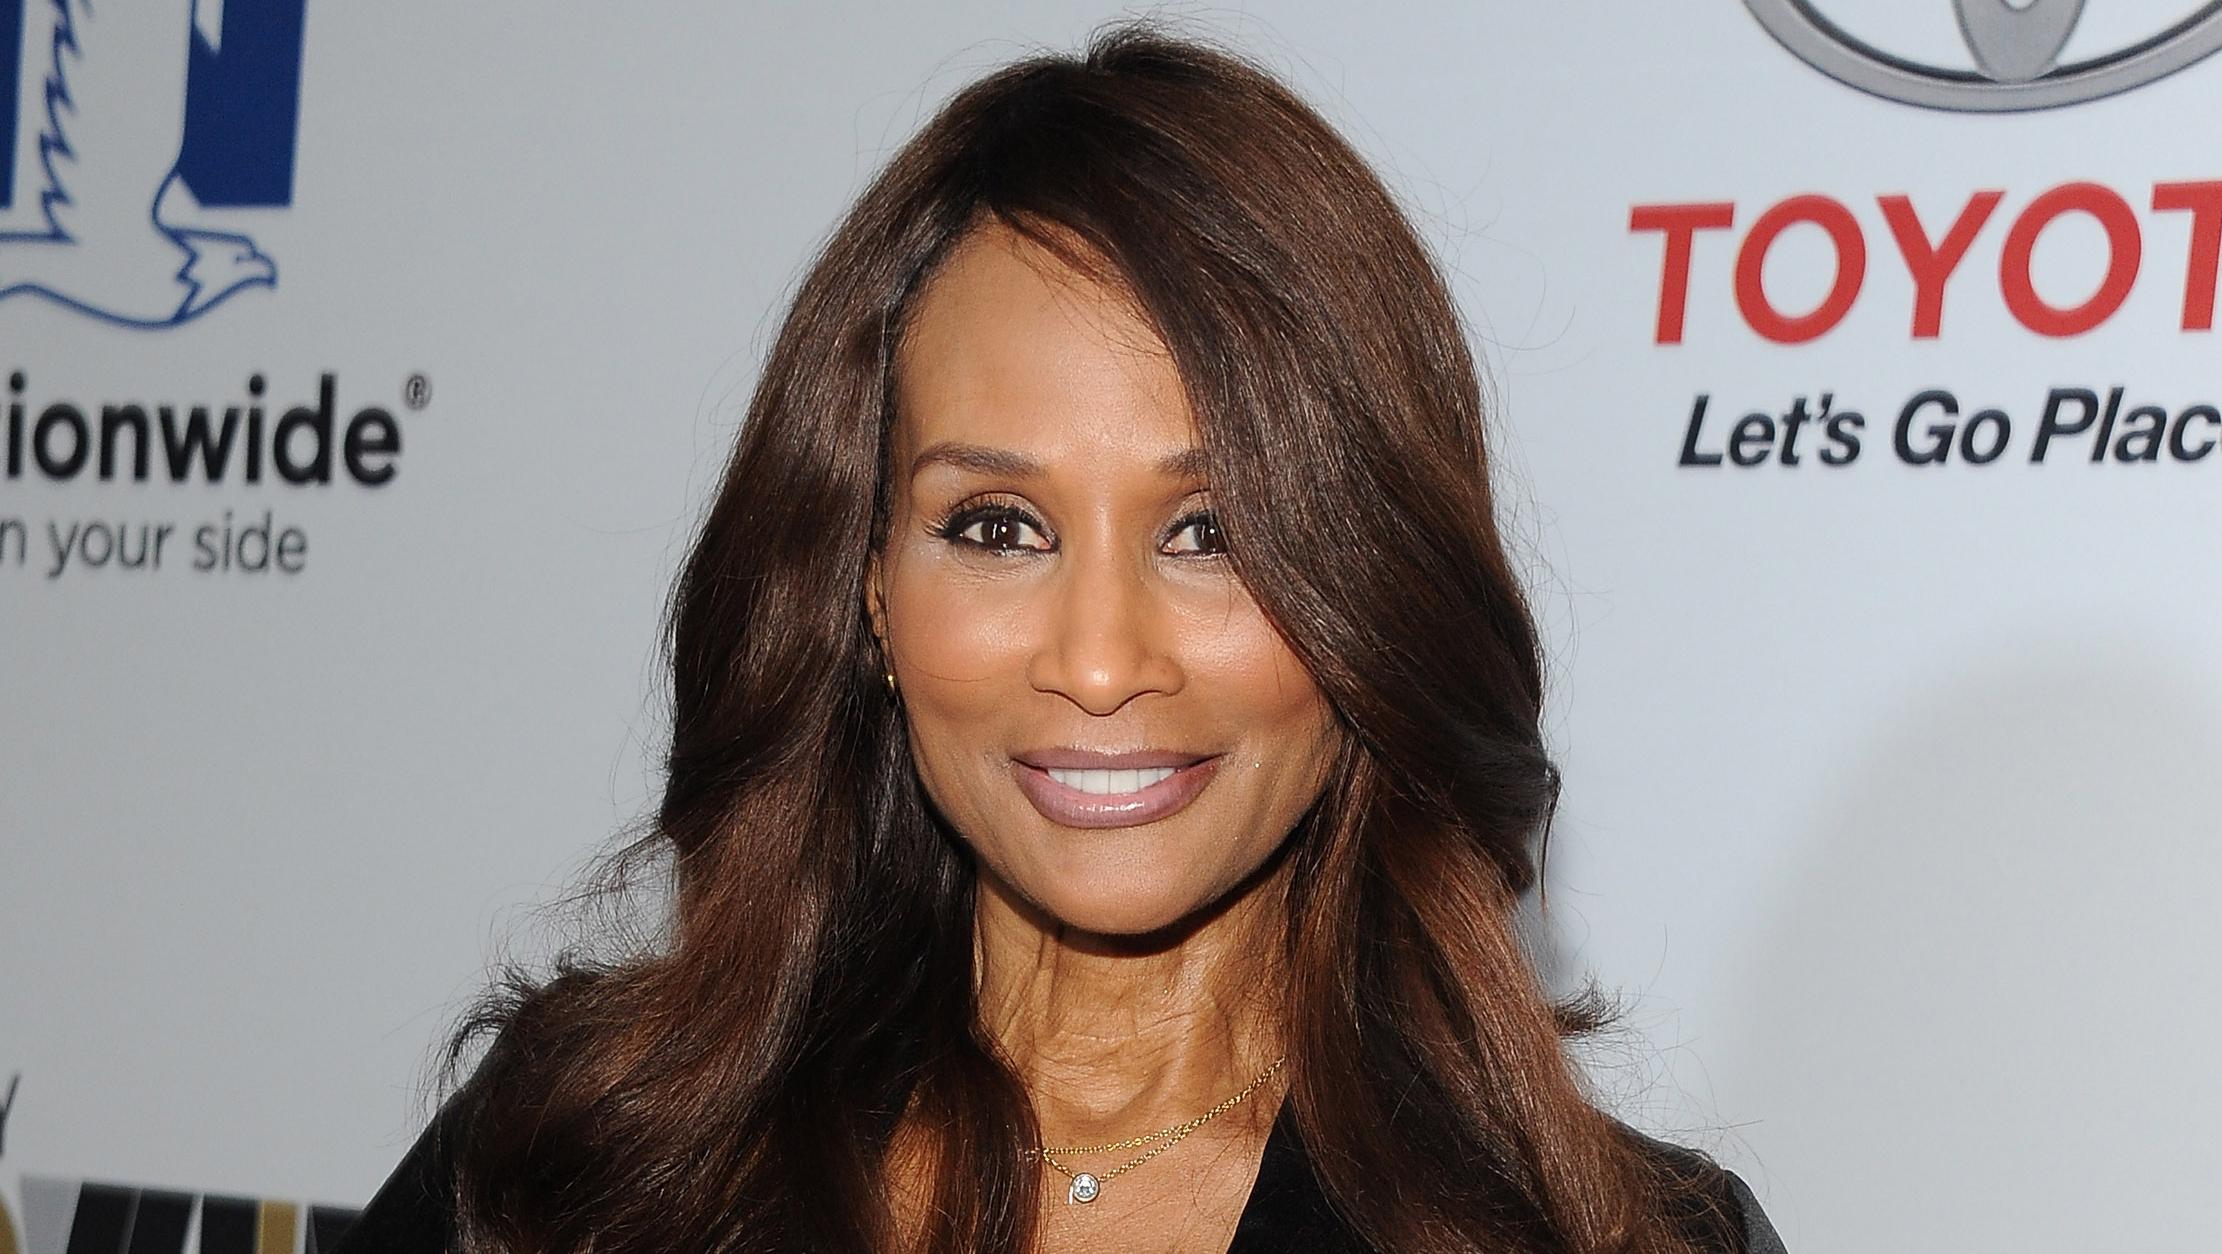 Regine Velasquez (b. 1970),Judi Evans born July 12, 1964 (age 54) Adult clip Kim Fields,Jessica Bendinger